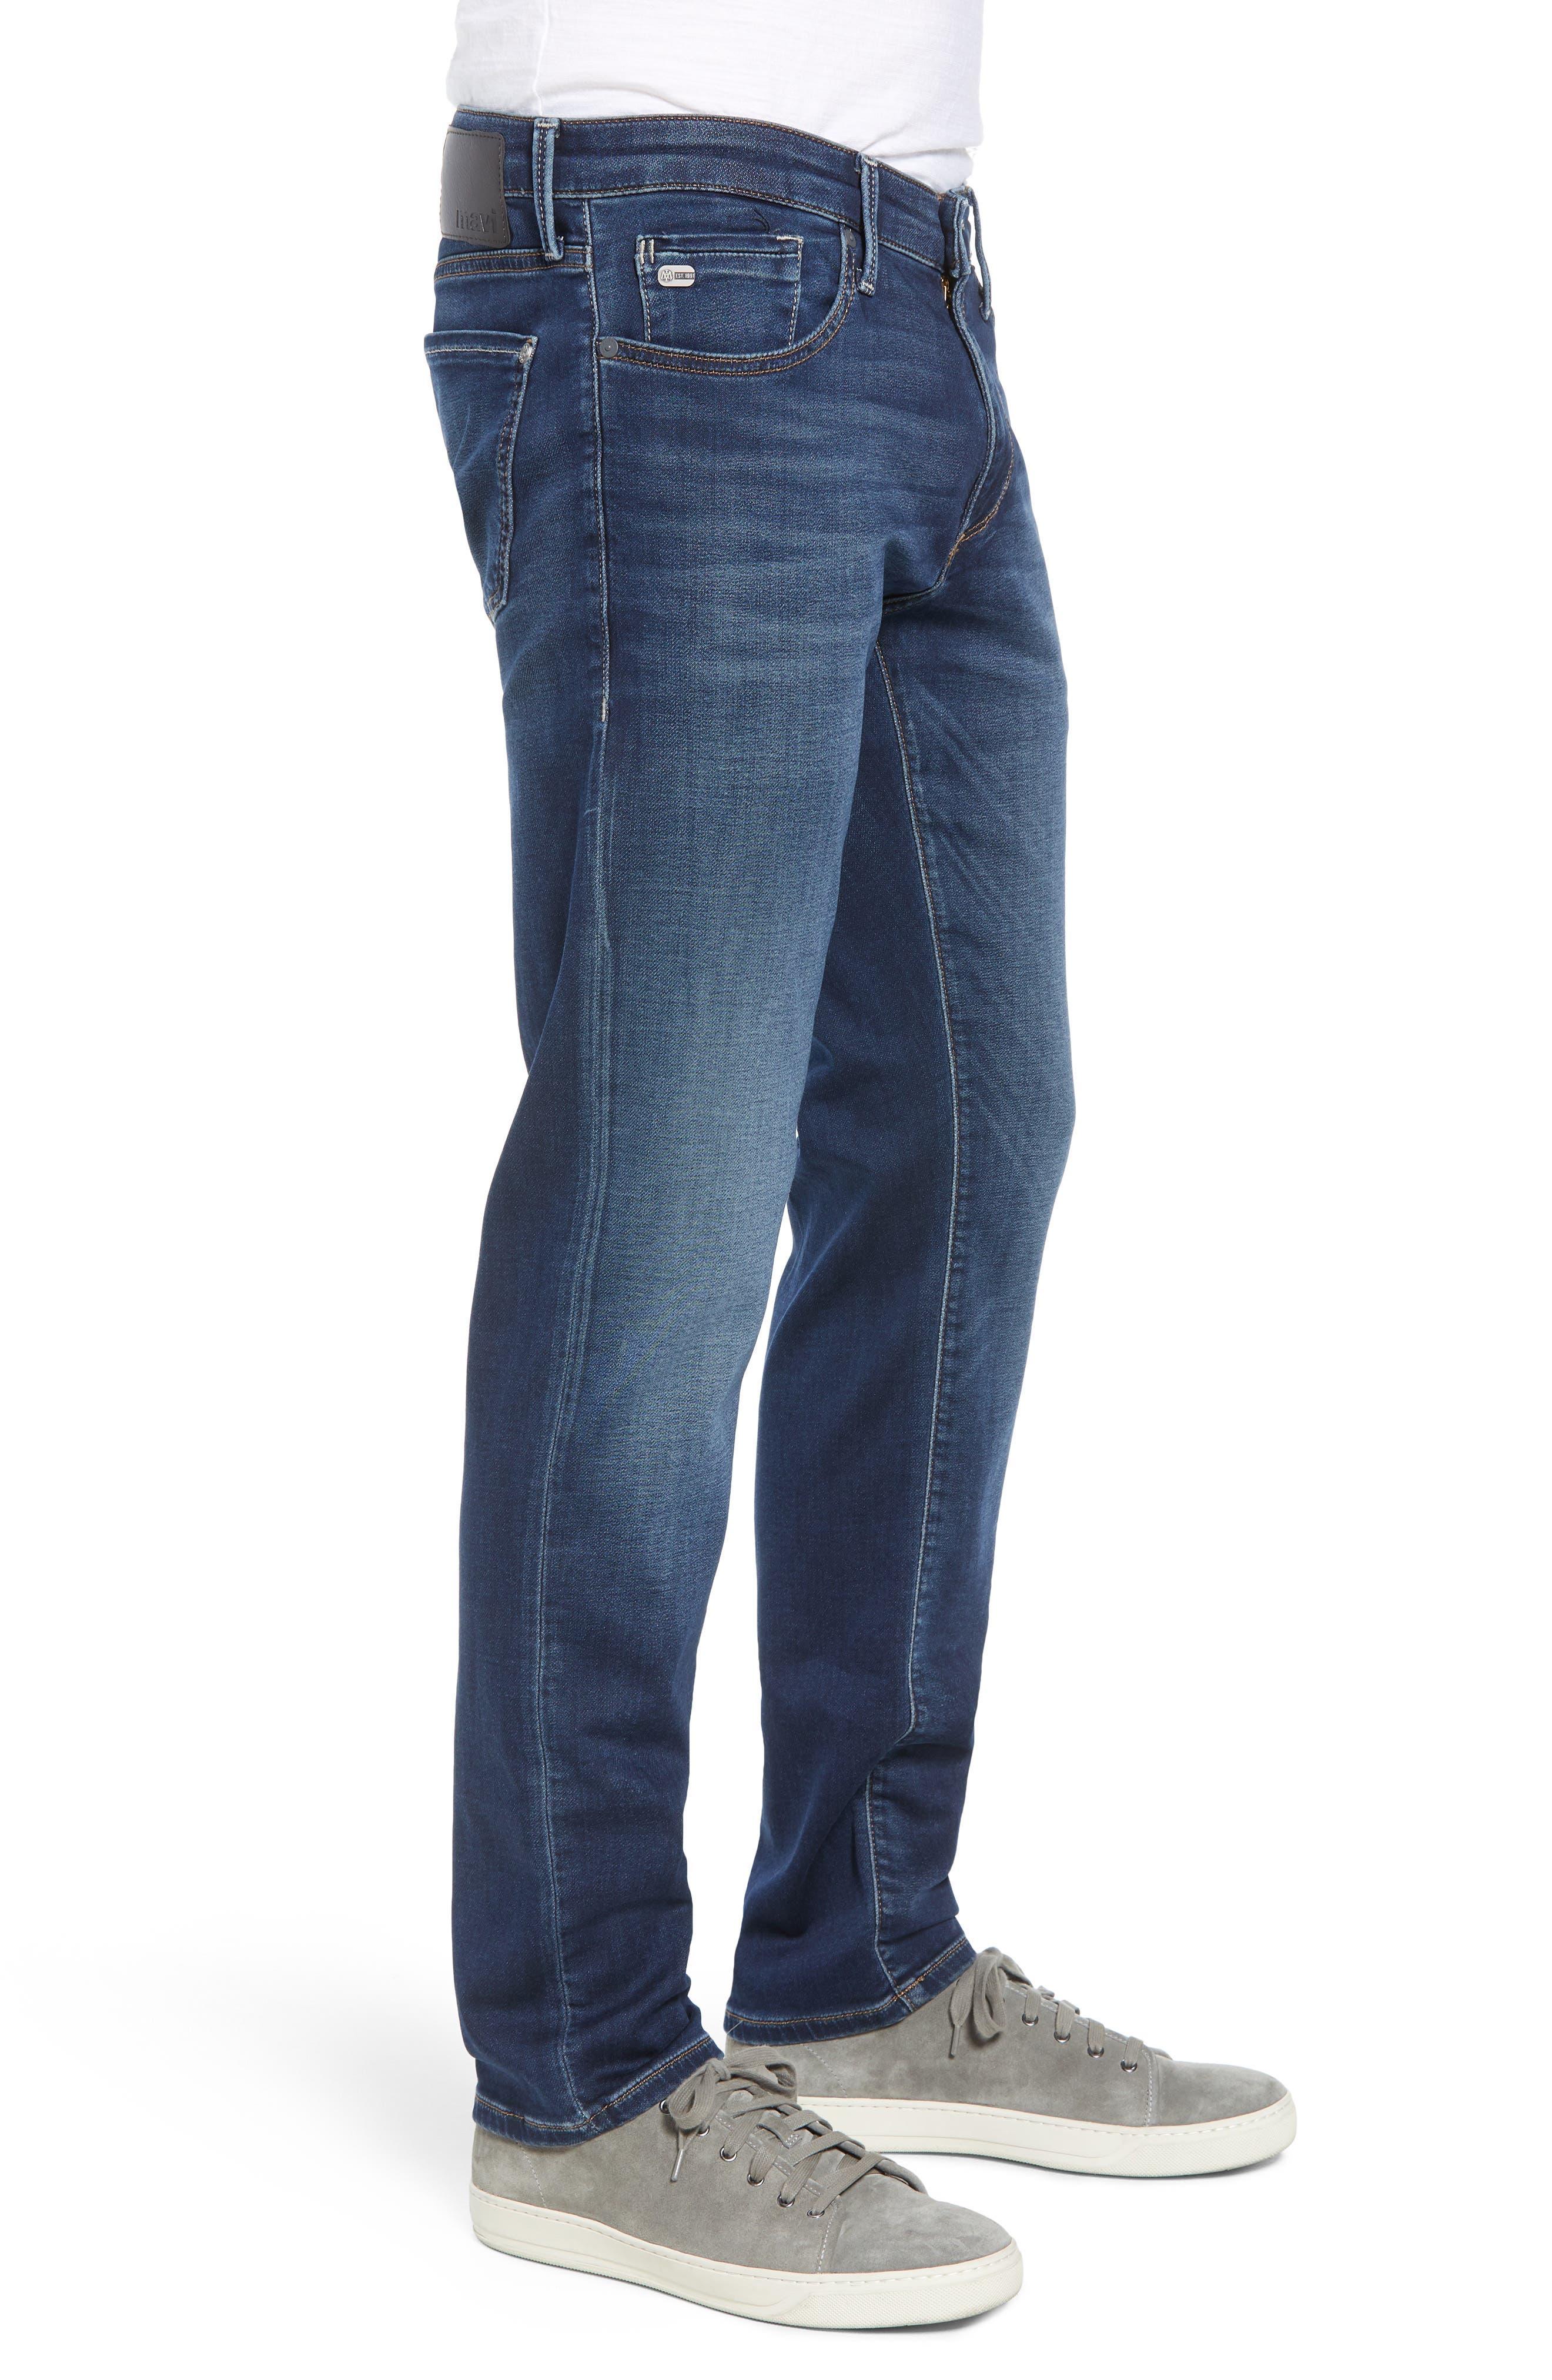 Jake Slim Fit Jeans,                             Alternate thumbnail 3, color,                             DARK SPORTY